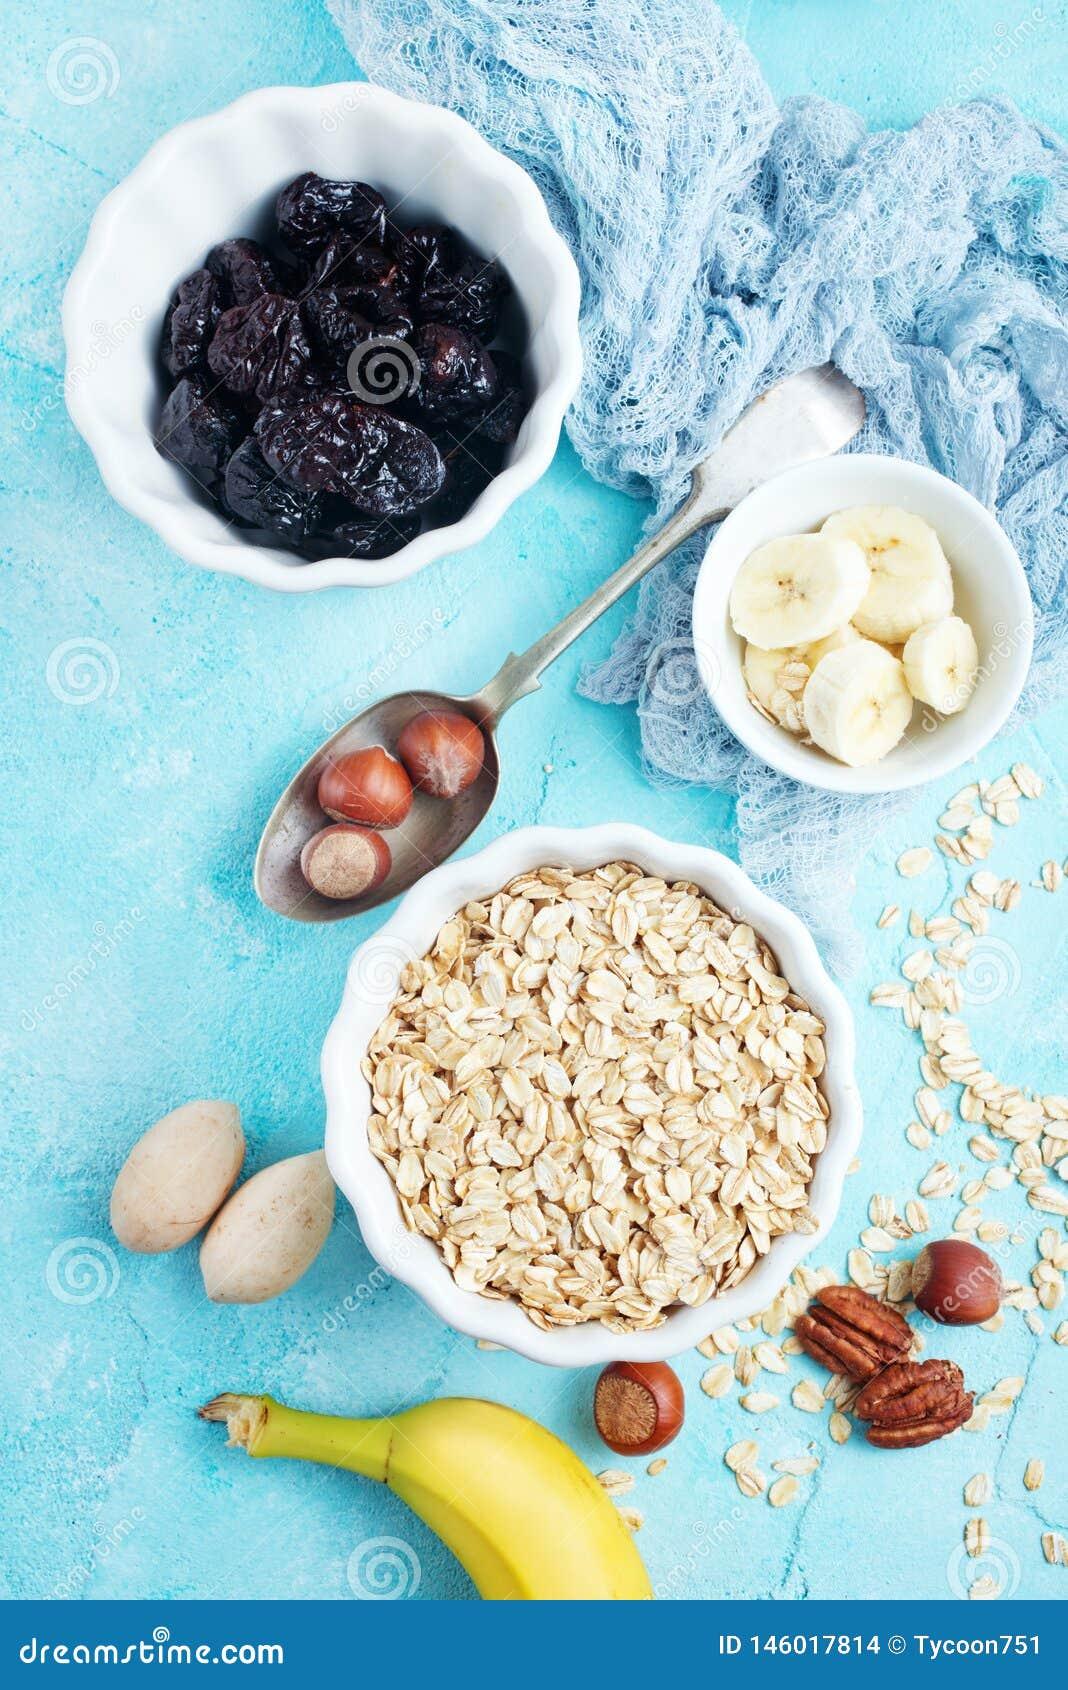 Ingrediants for breakfast